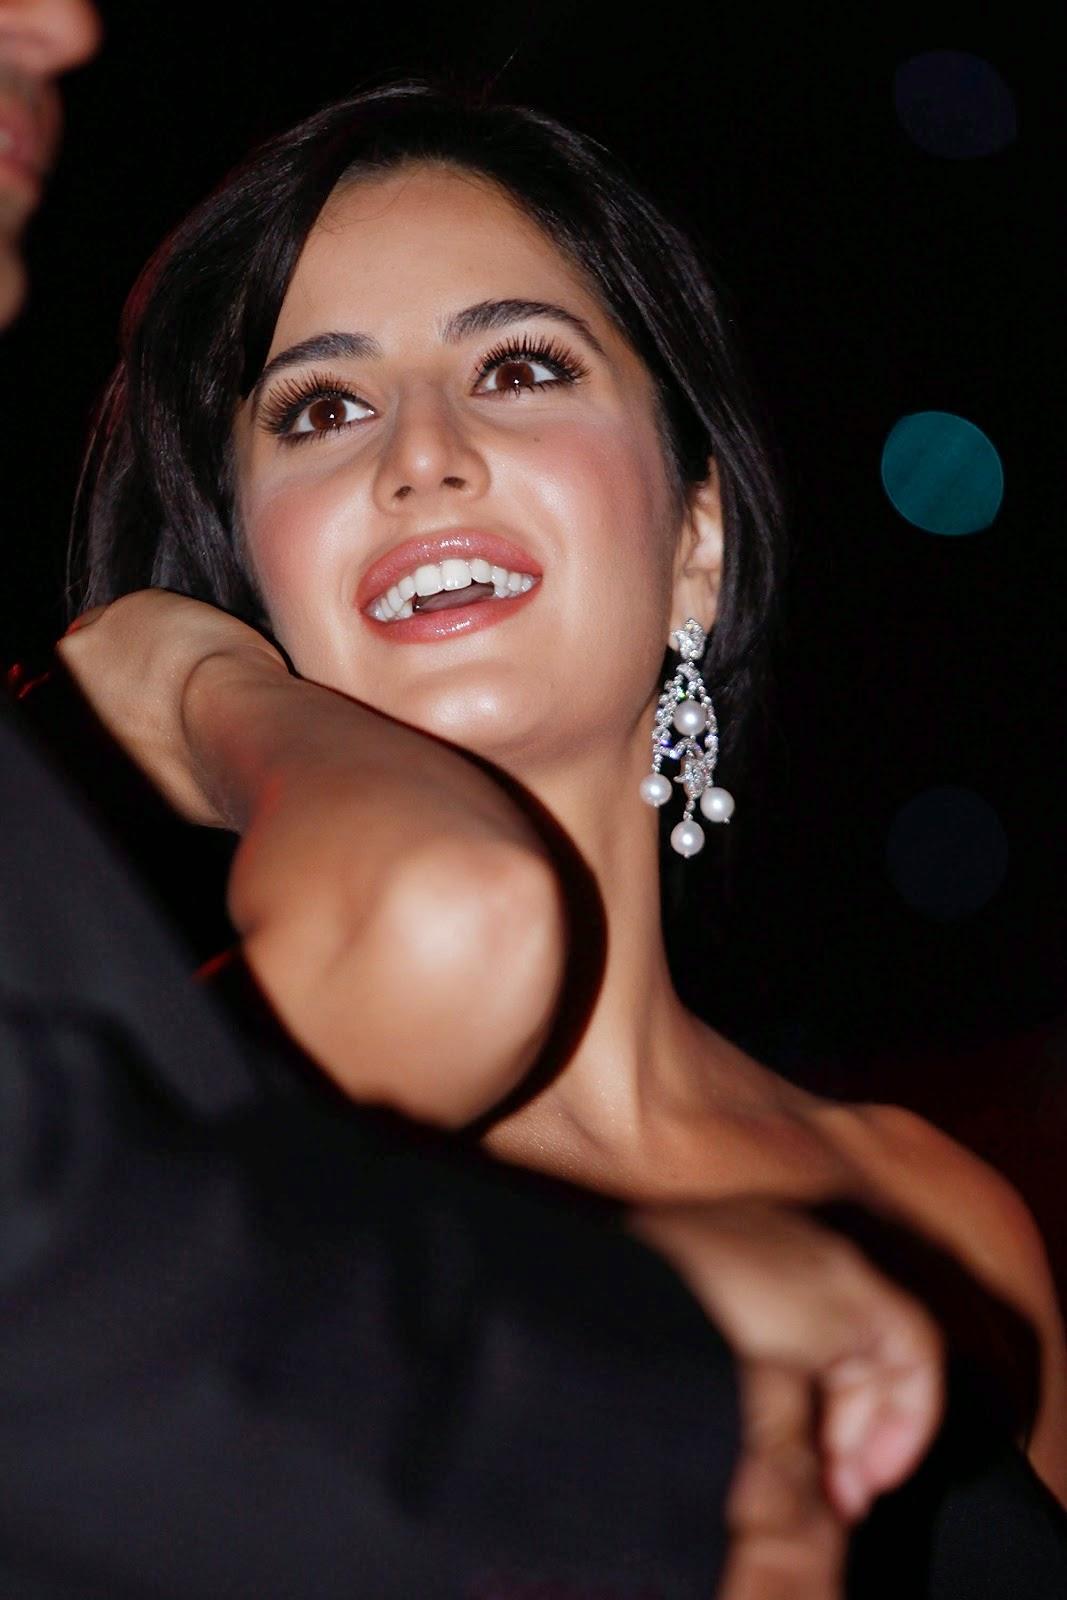 Katrina Kaif @ India Autocar Awards in Mumbai January 7, 2009 HQ Images